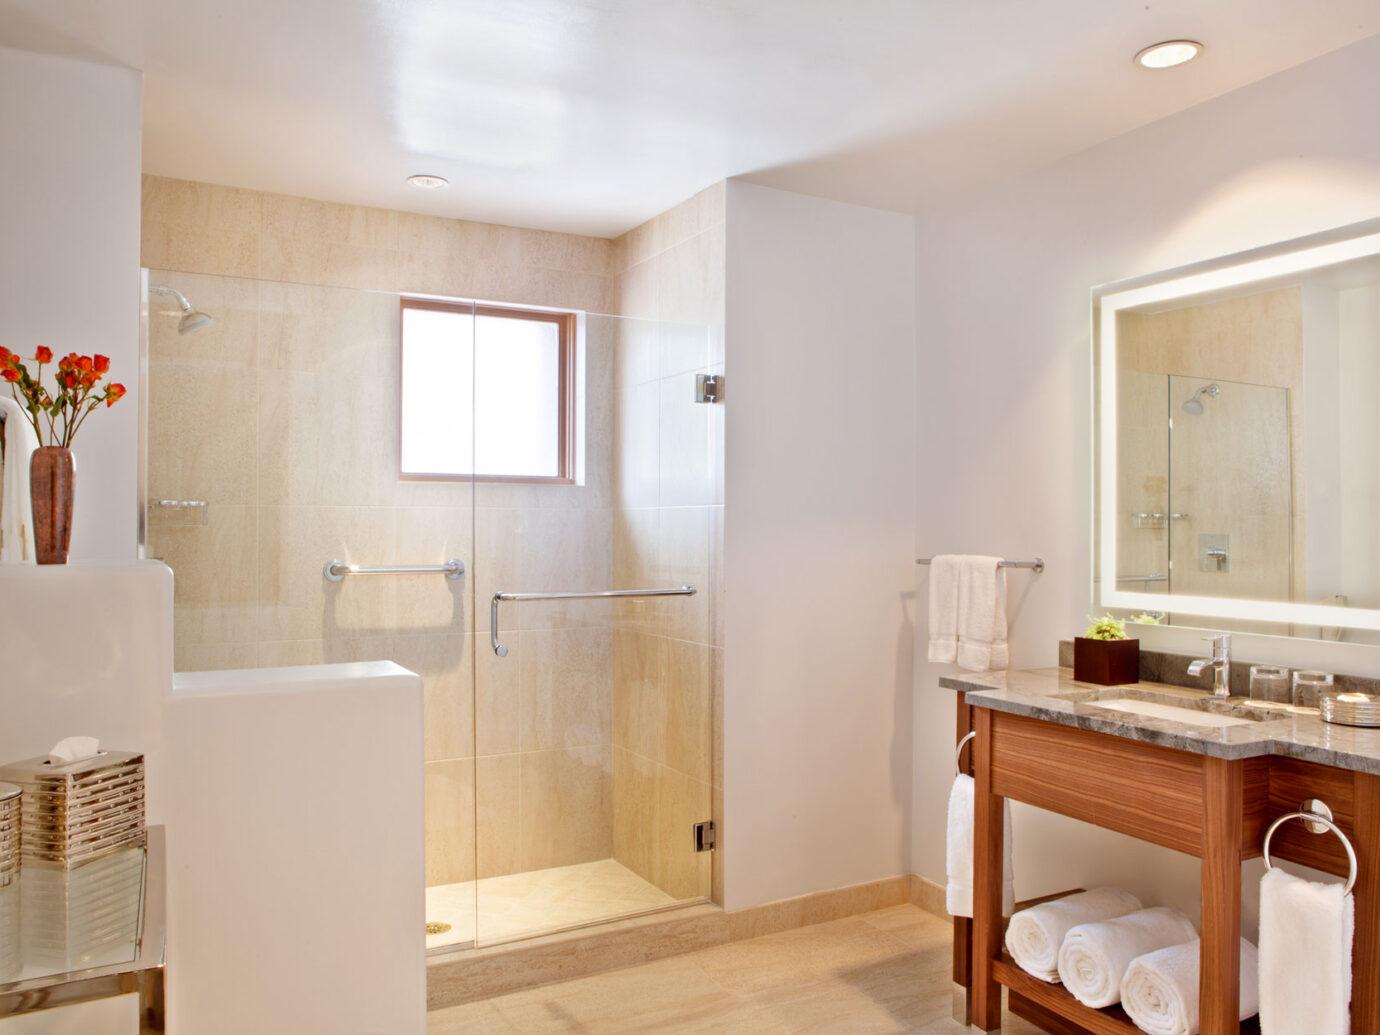 Bathroom the Rosewood Inn Anasazi